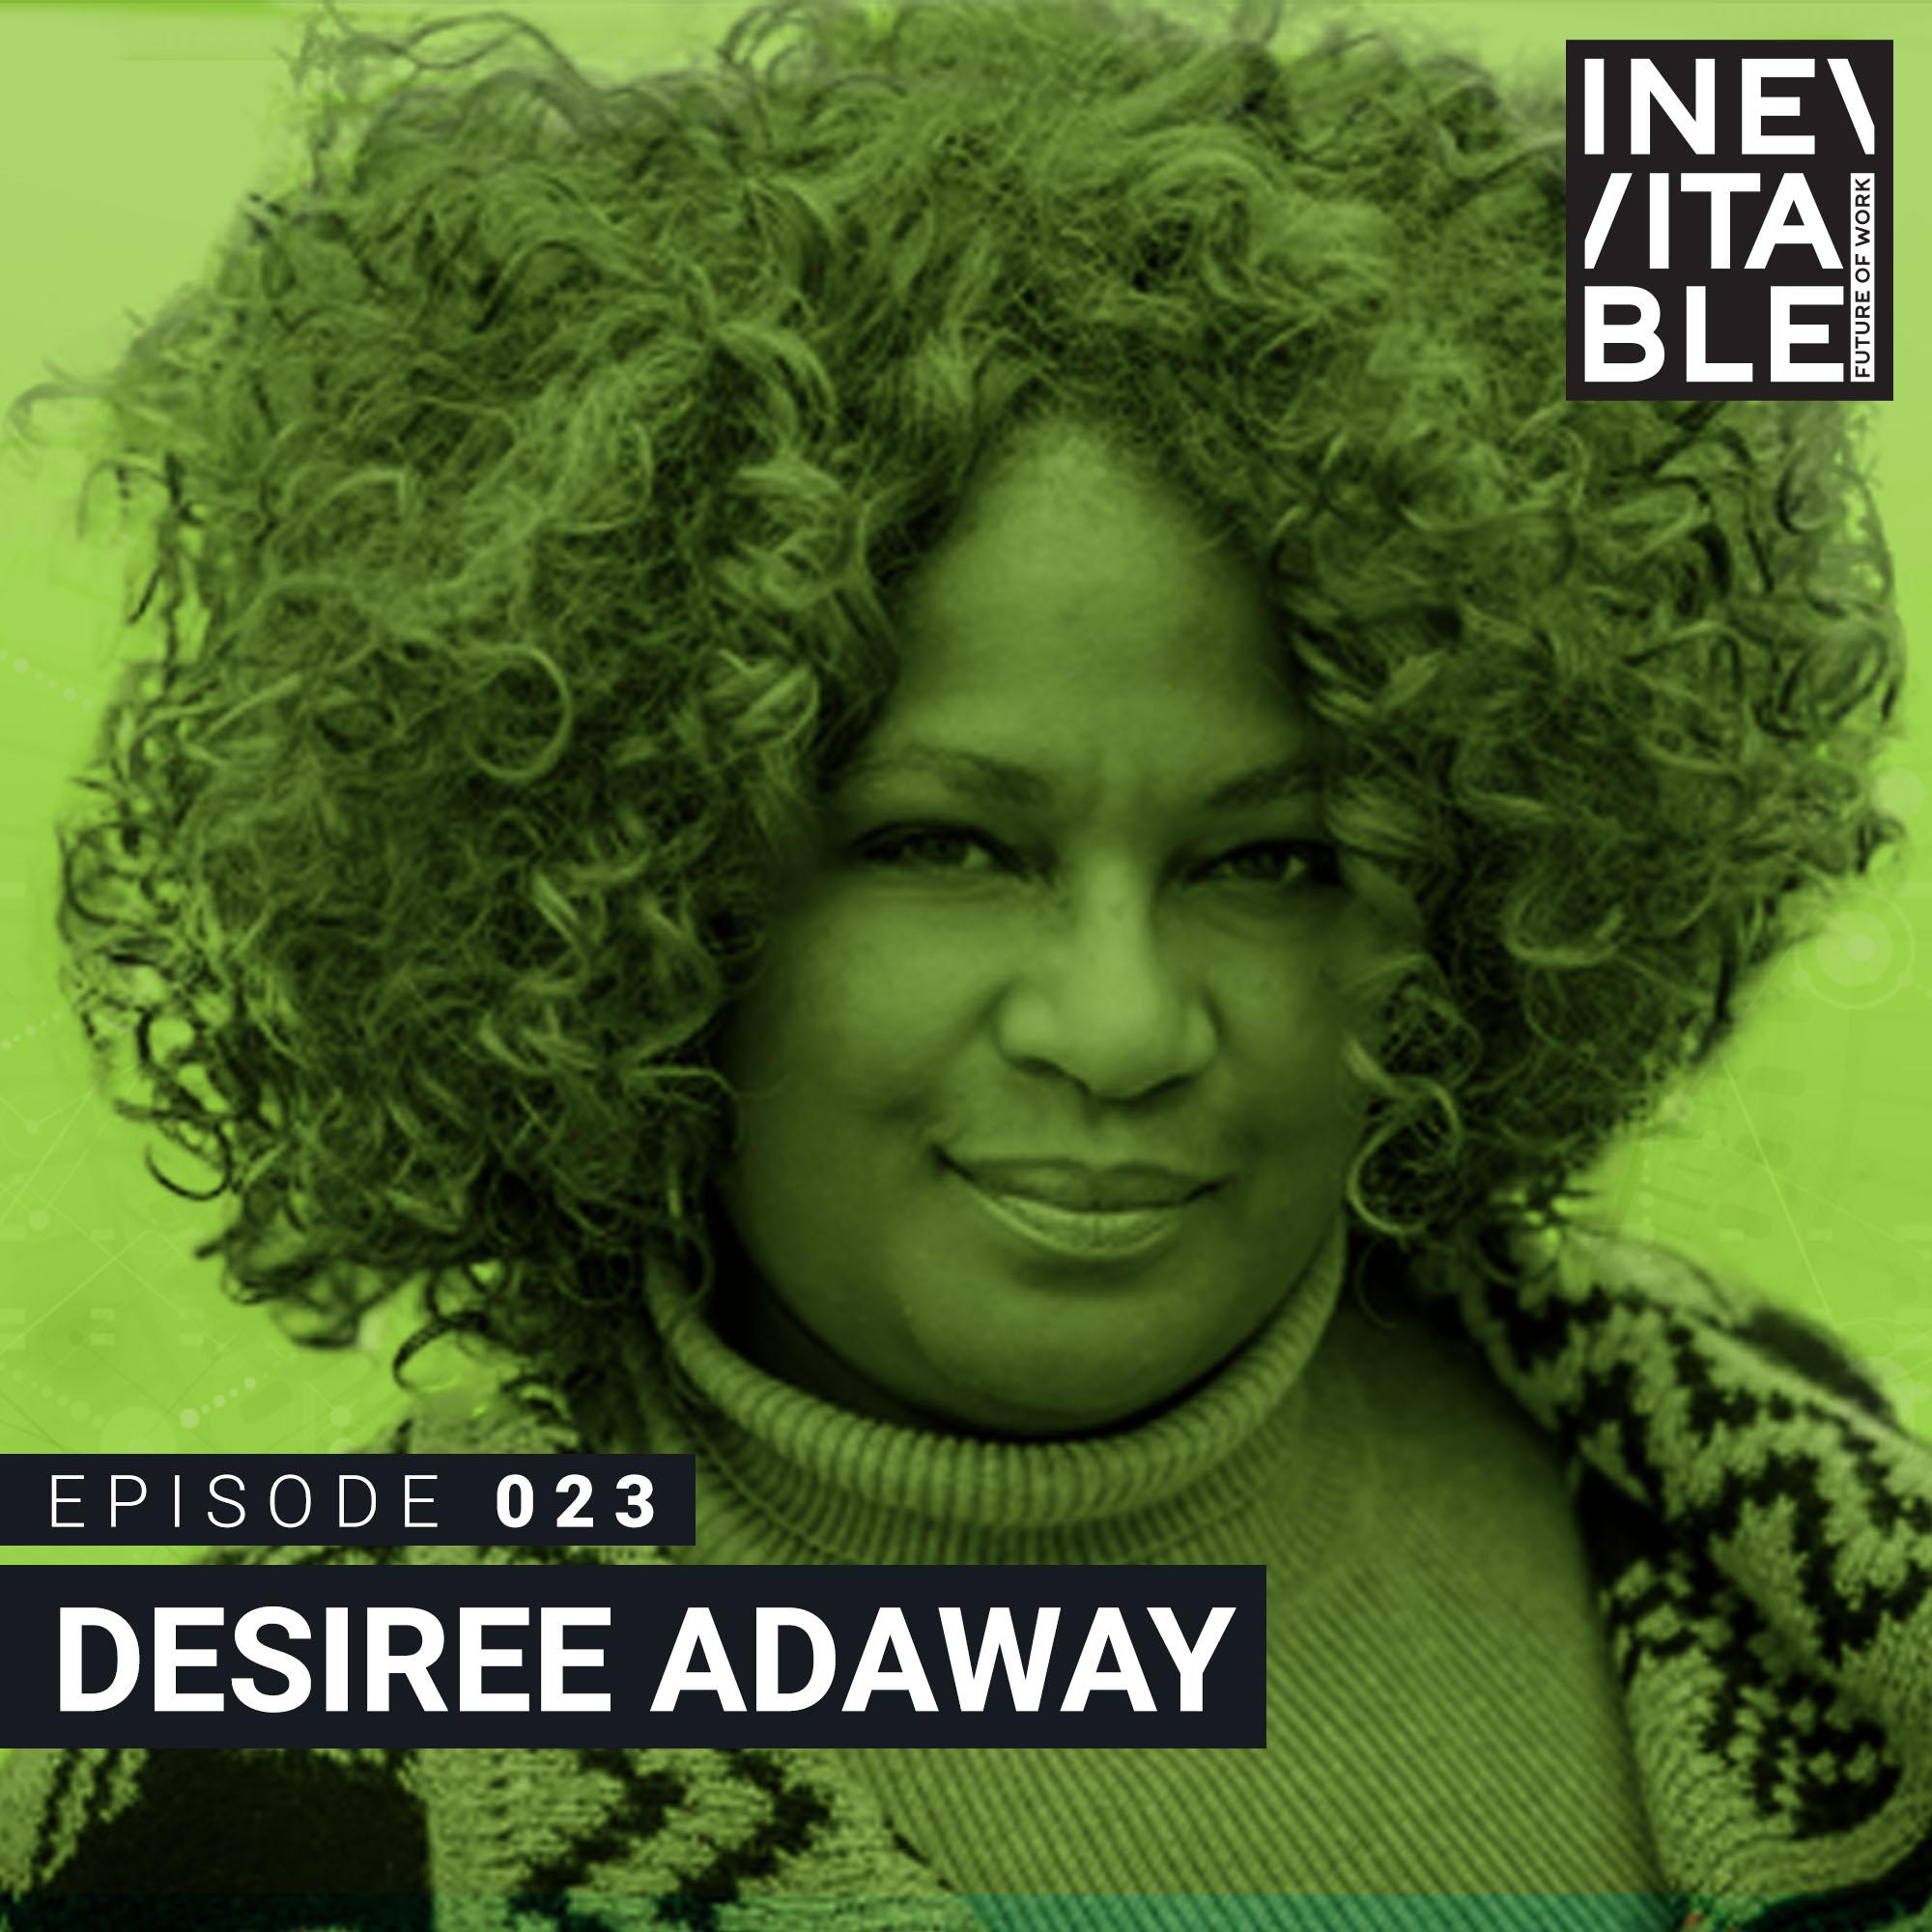 Desiree Adaway